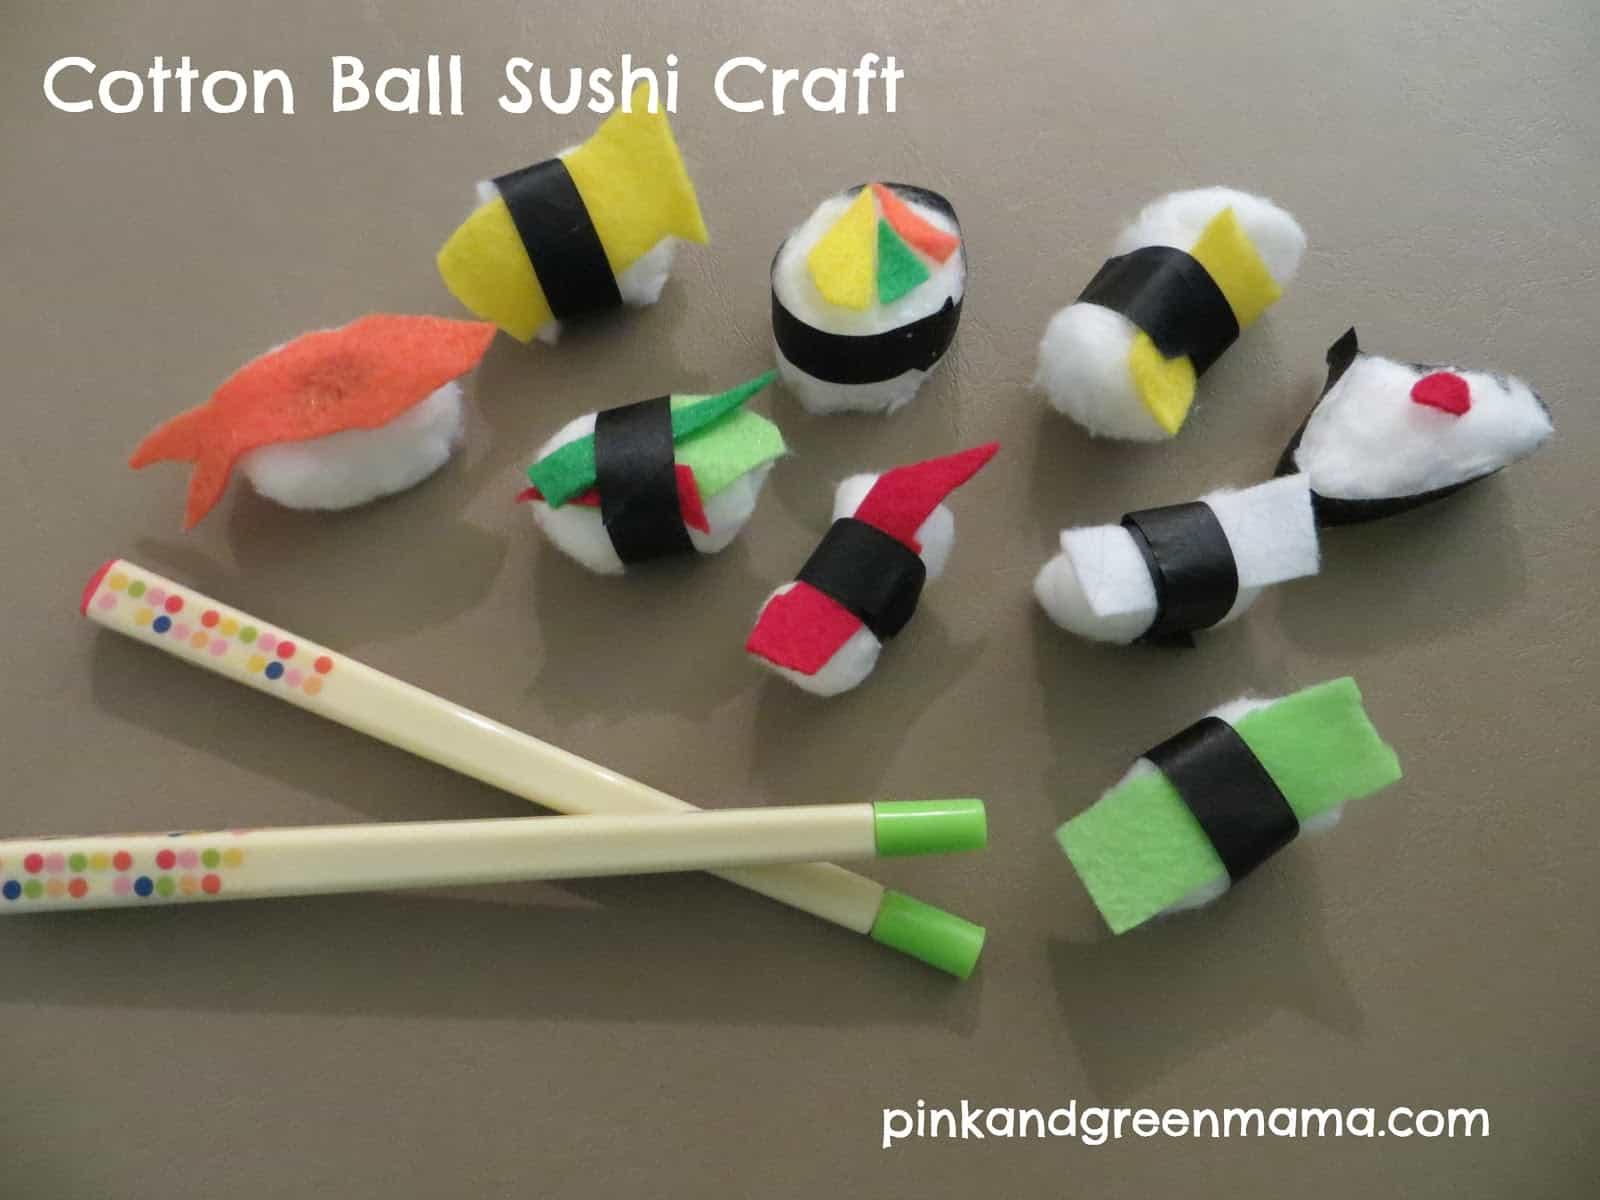 Cotton ball sushi